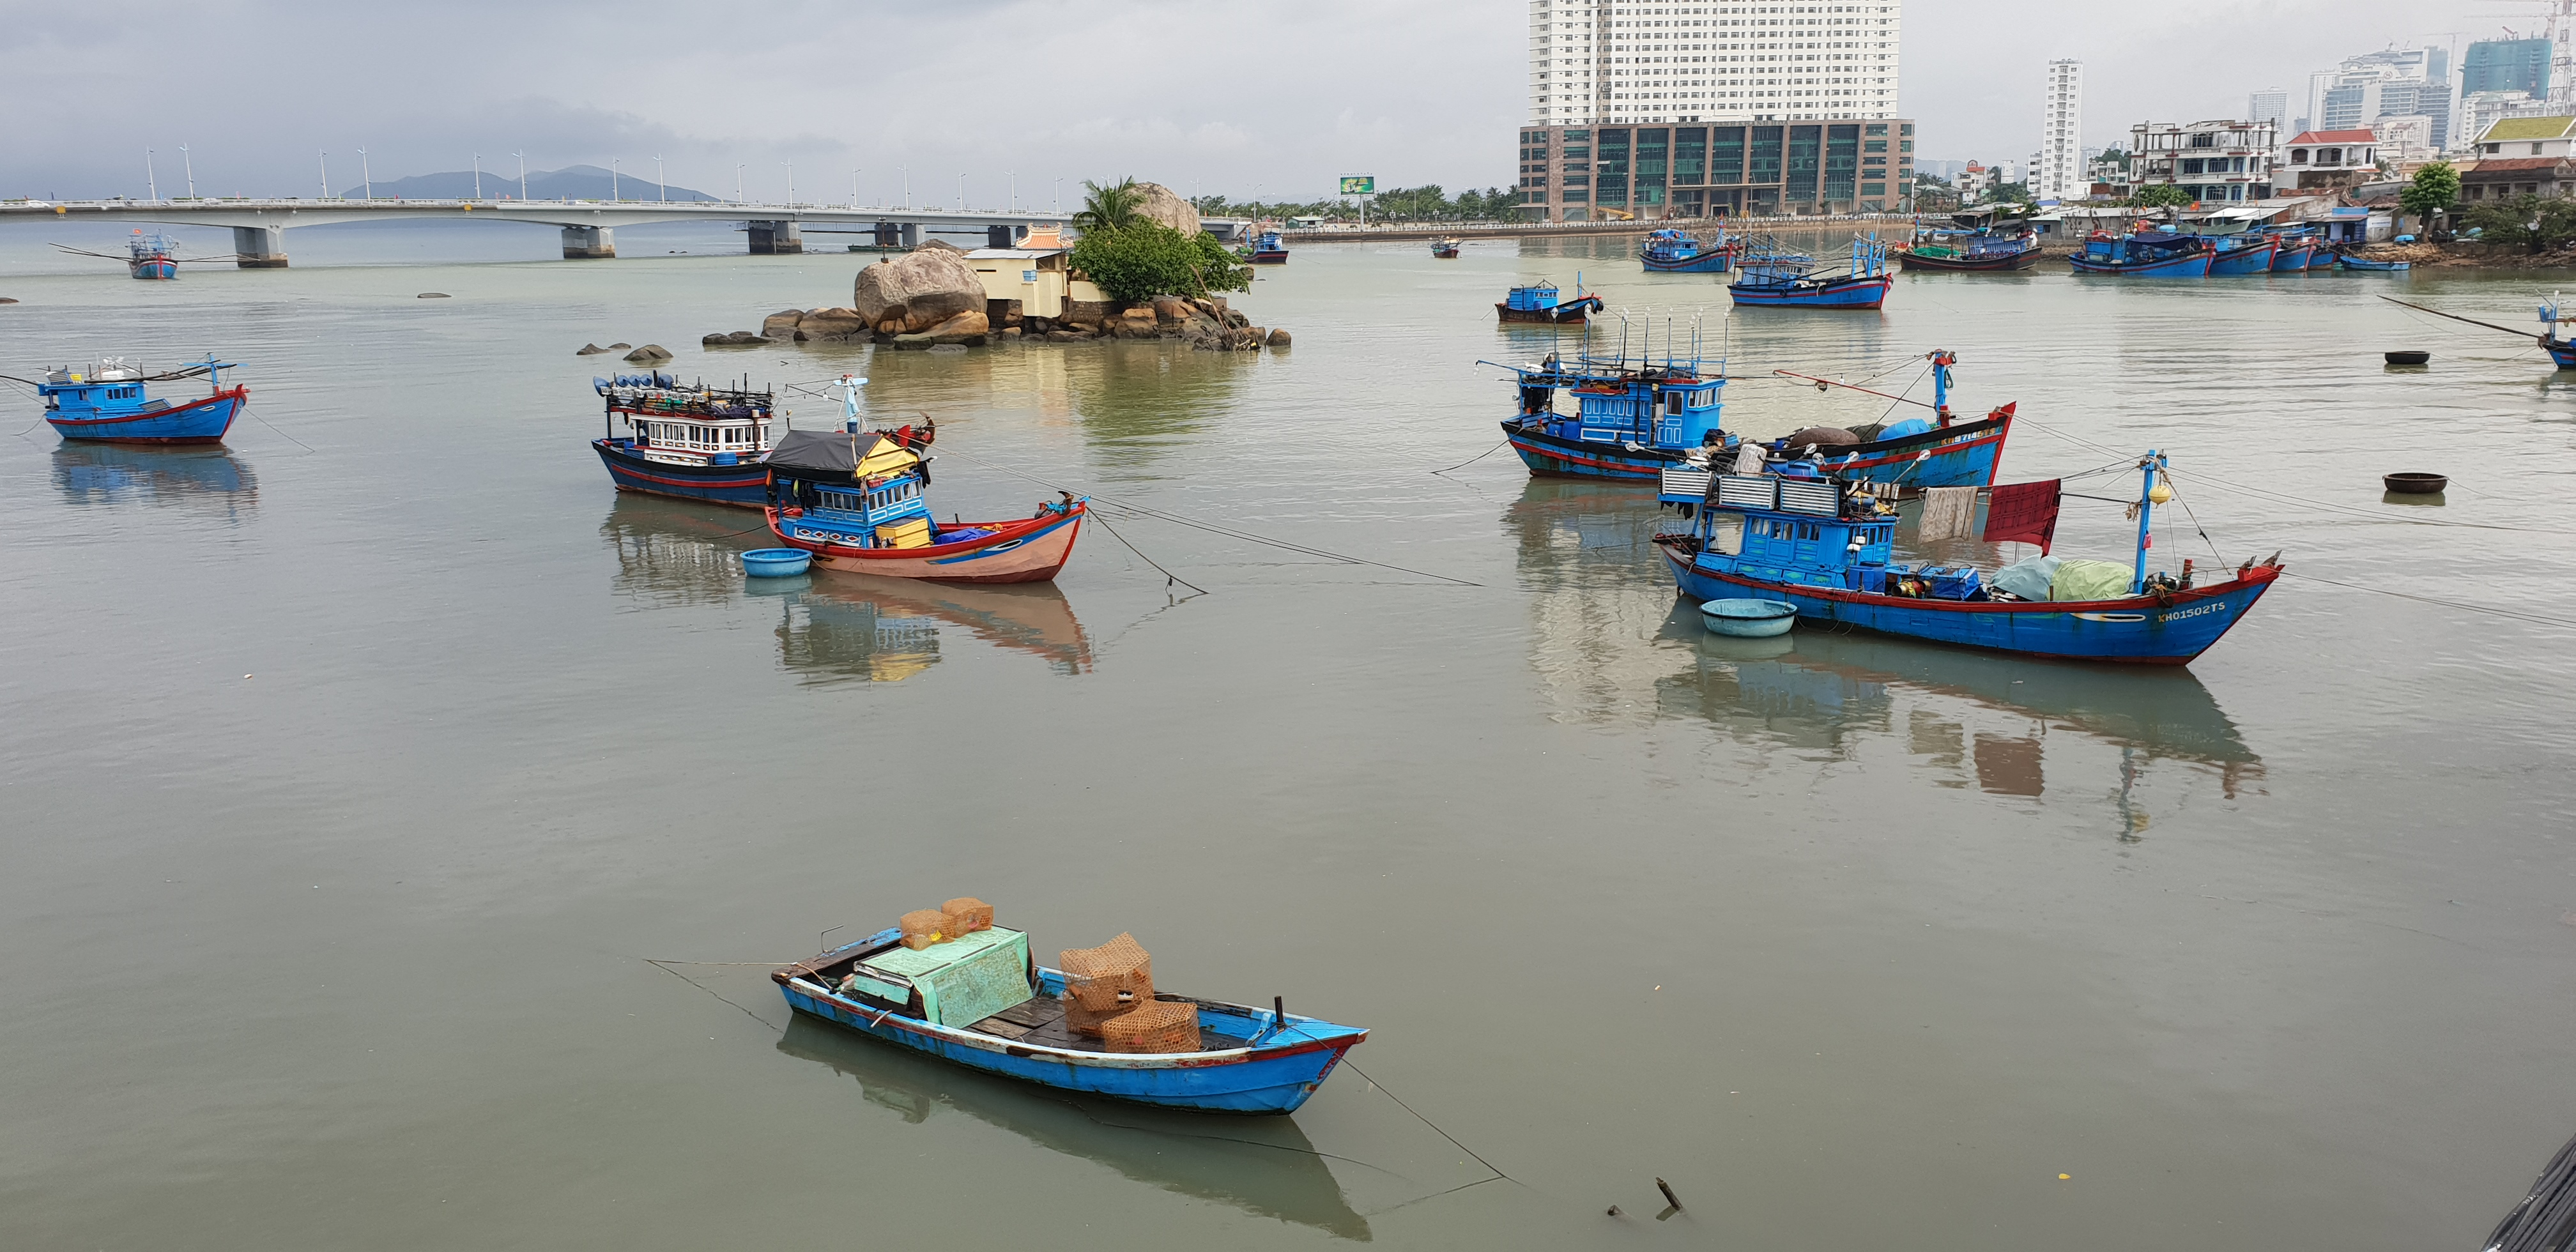 cai 강, [베트남 나짱] 바다와 배를 감상하다, 가건물, 나짱 강, 배 그림, 베트남 강, 베트남 바다, 베트남 배, 사원 구경, 이모, 파란 배